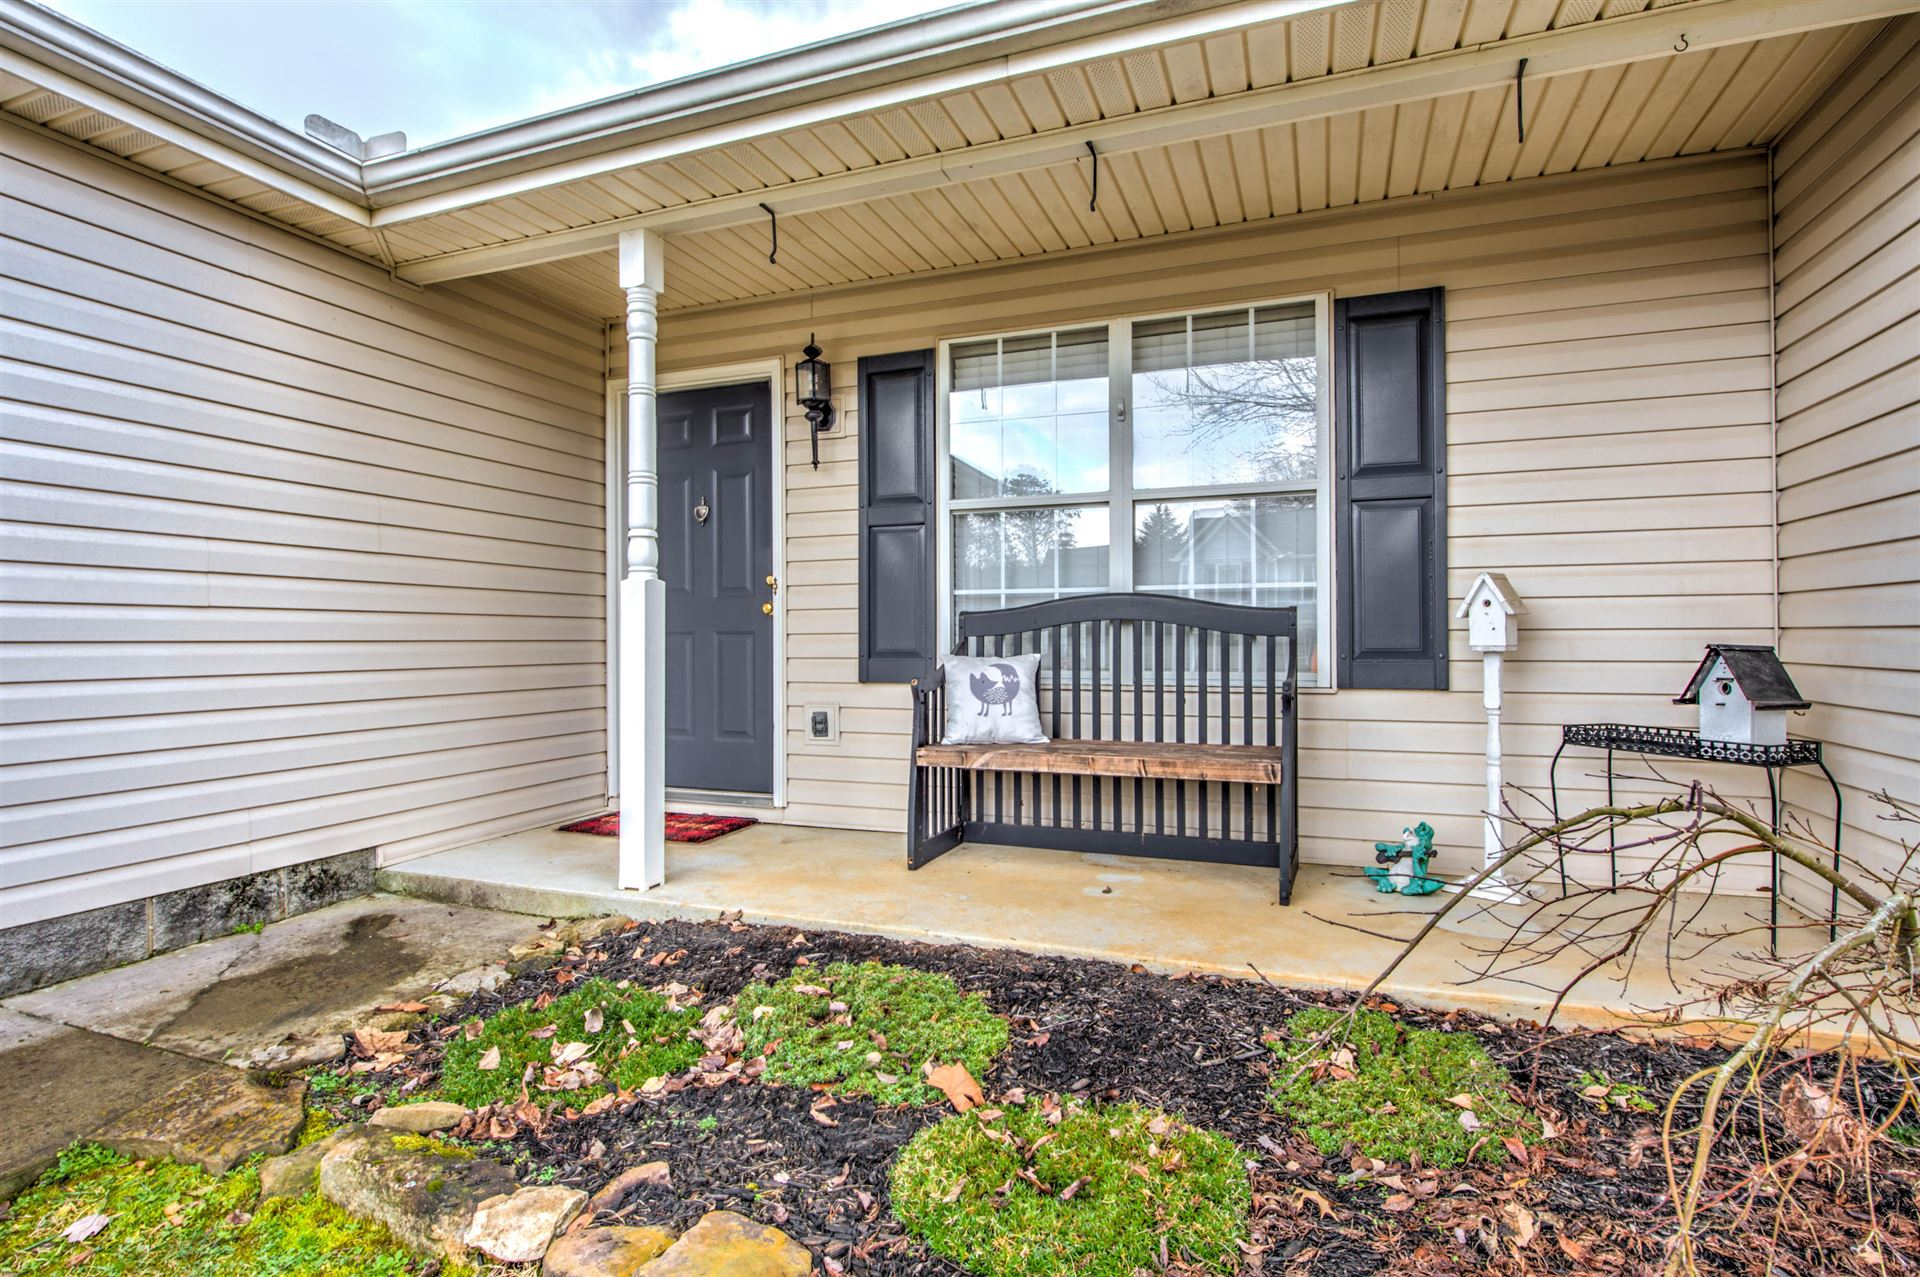 Photo of 6955 Yellow Oak Lane, Knoxville, TN 37931 (MLS # 1139285)